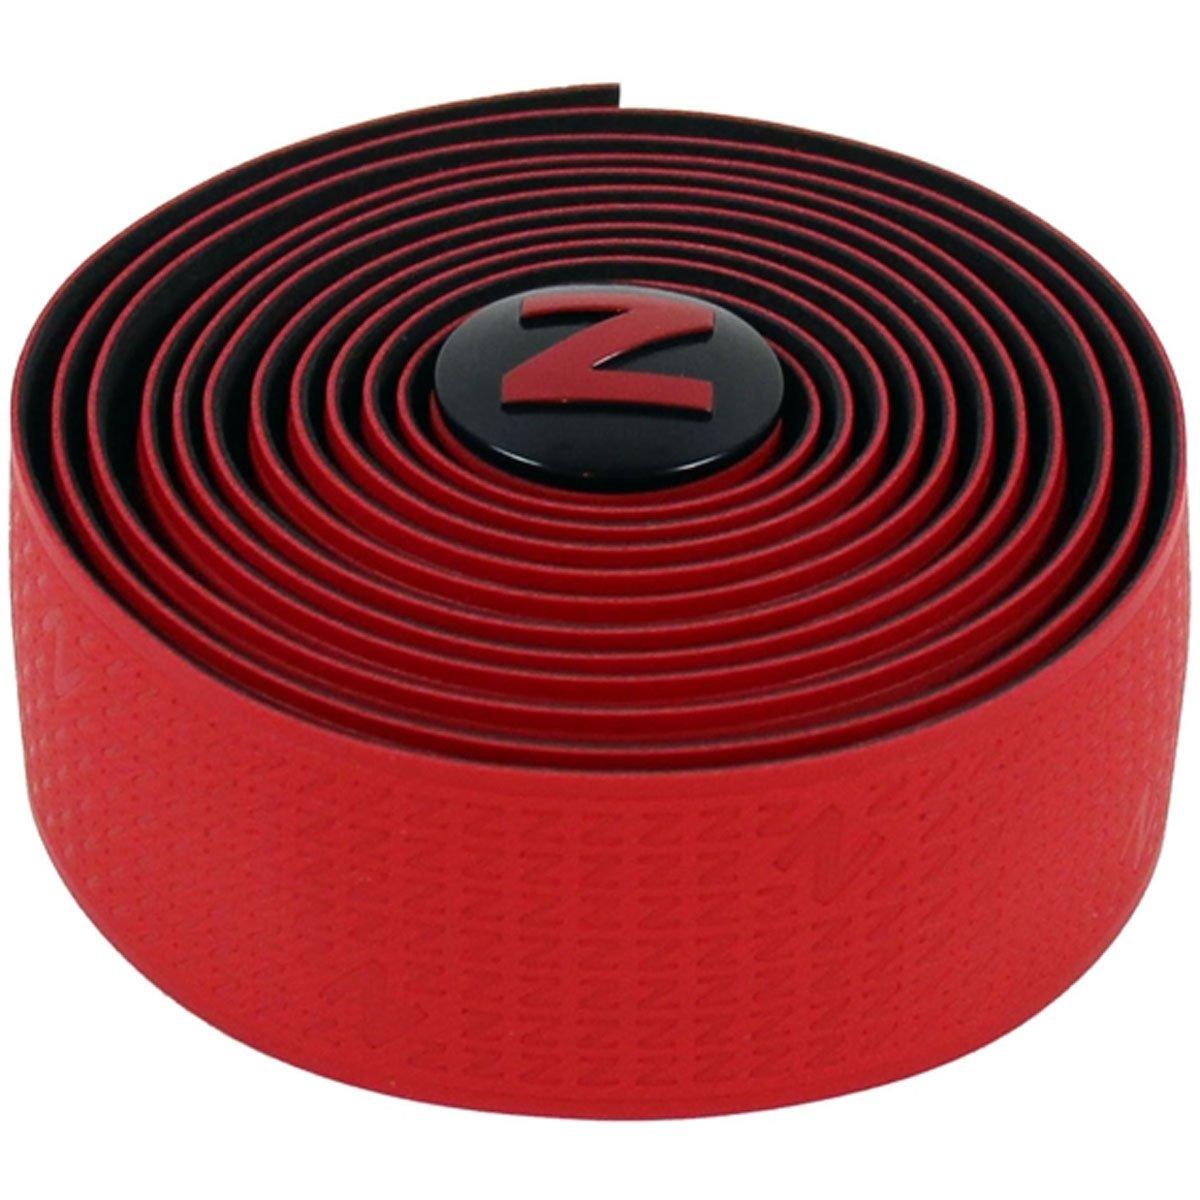 Zevlin Z-Attack Road Gravel Bicycle Handlebar Bar Tape Single Color